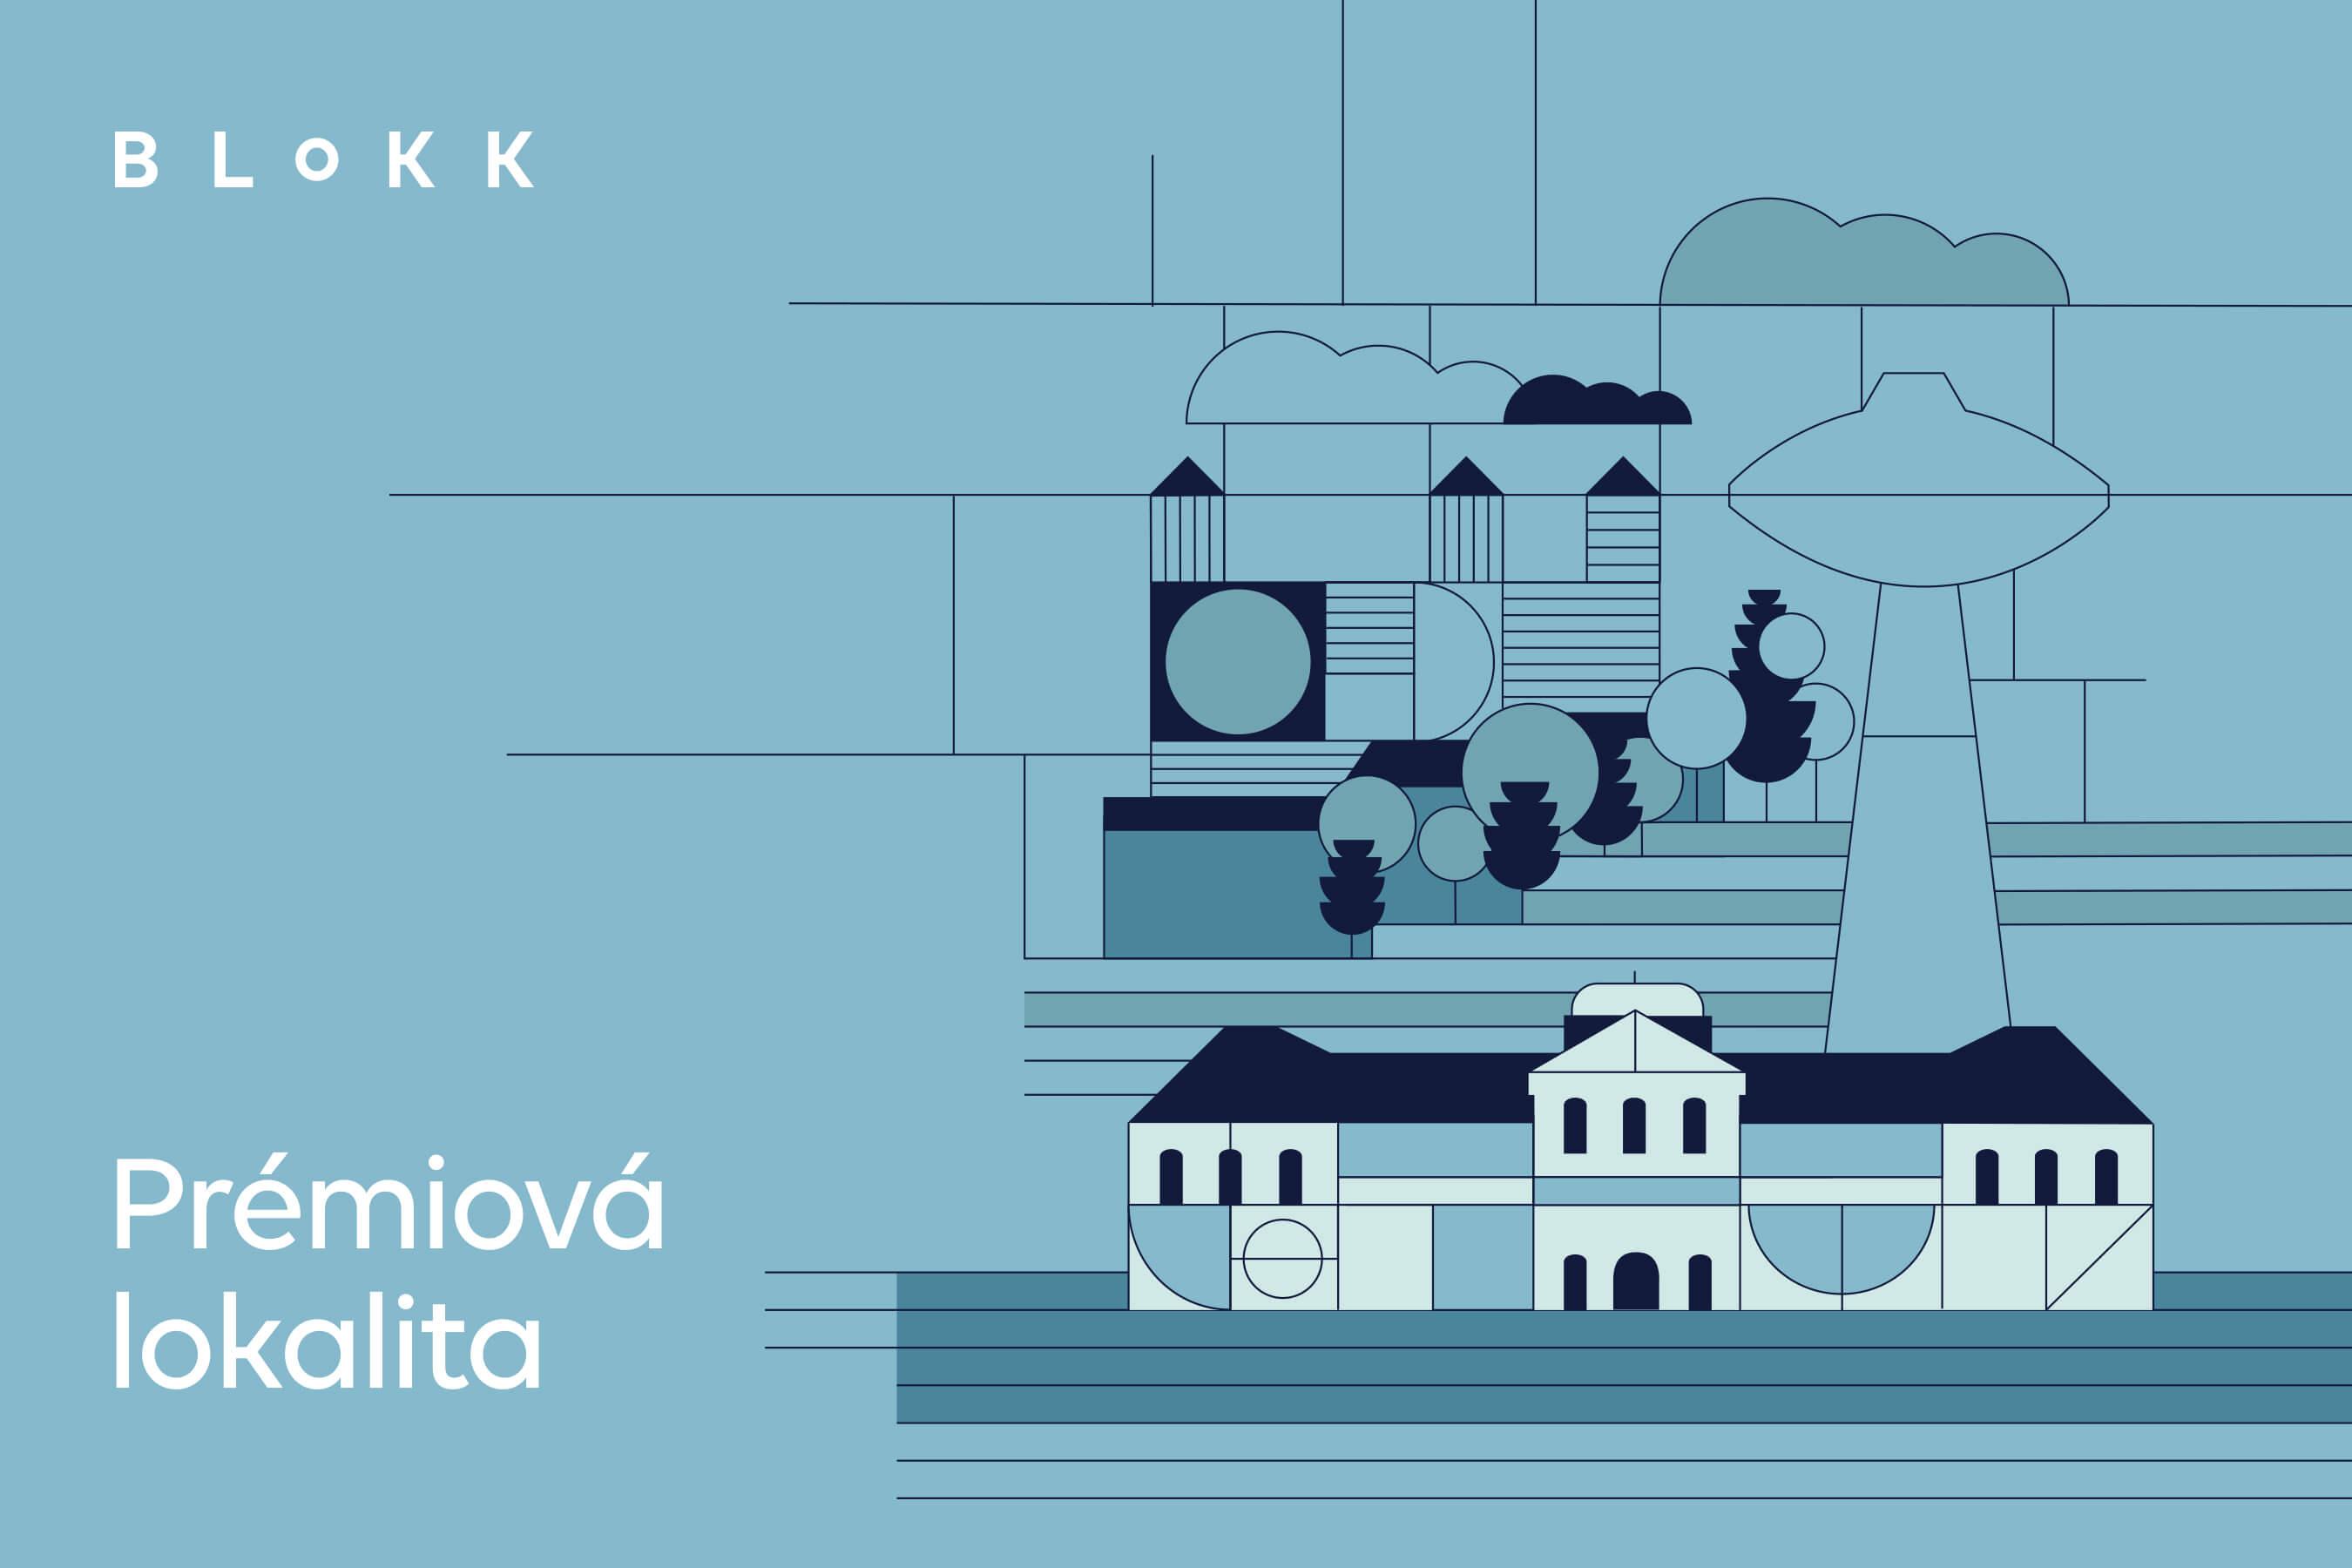 BLOKK_lokalita2